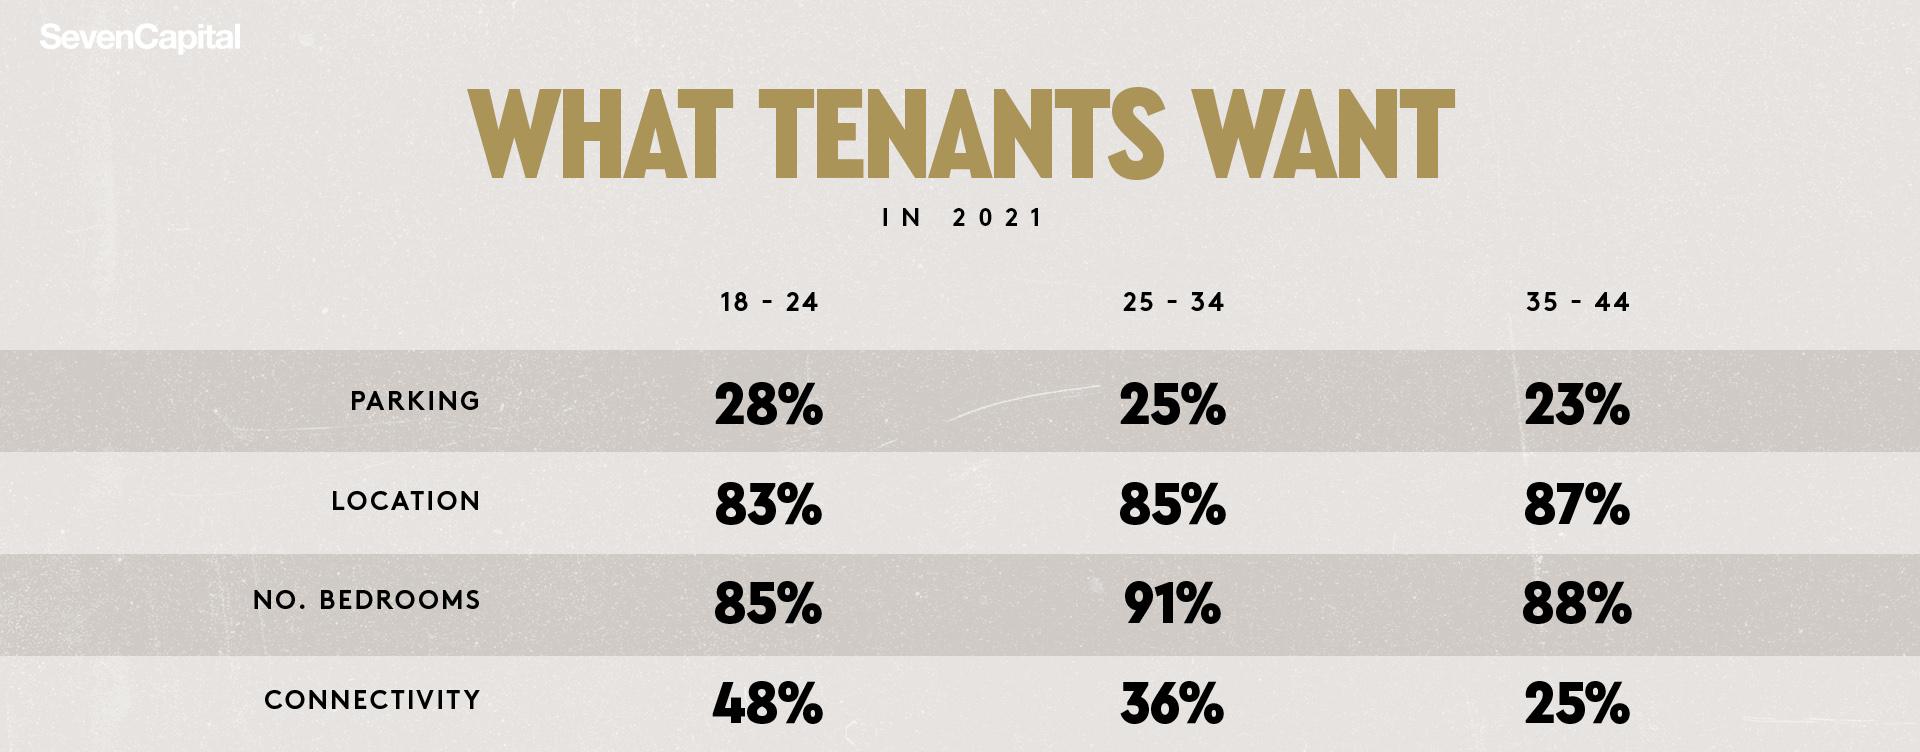 What Do Tenants Want Survey